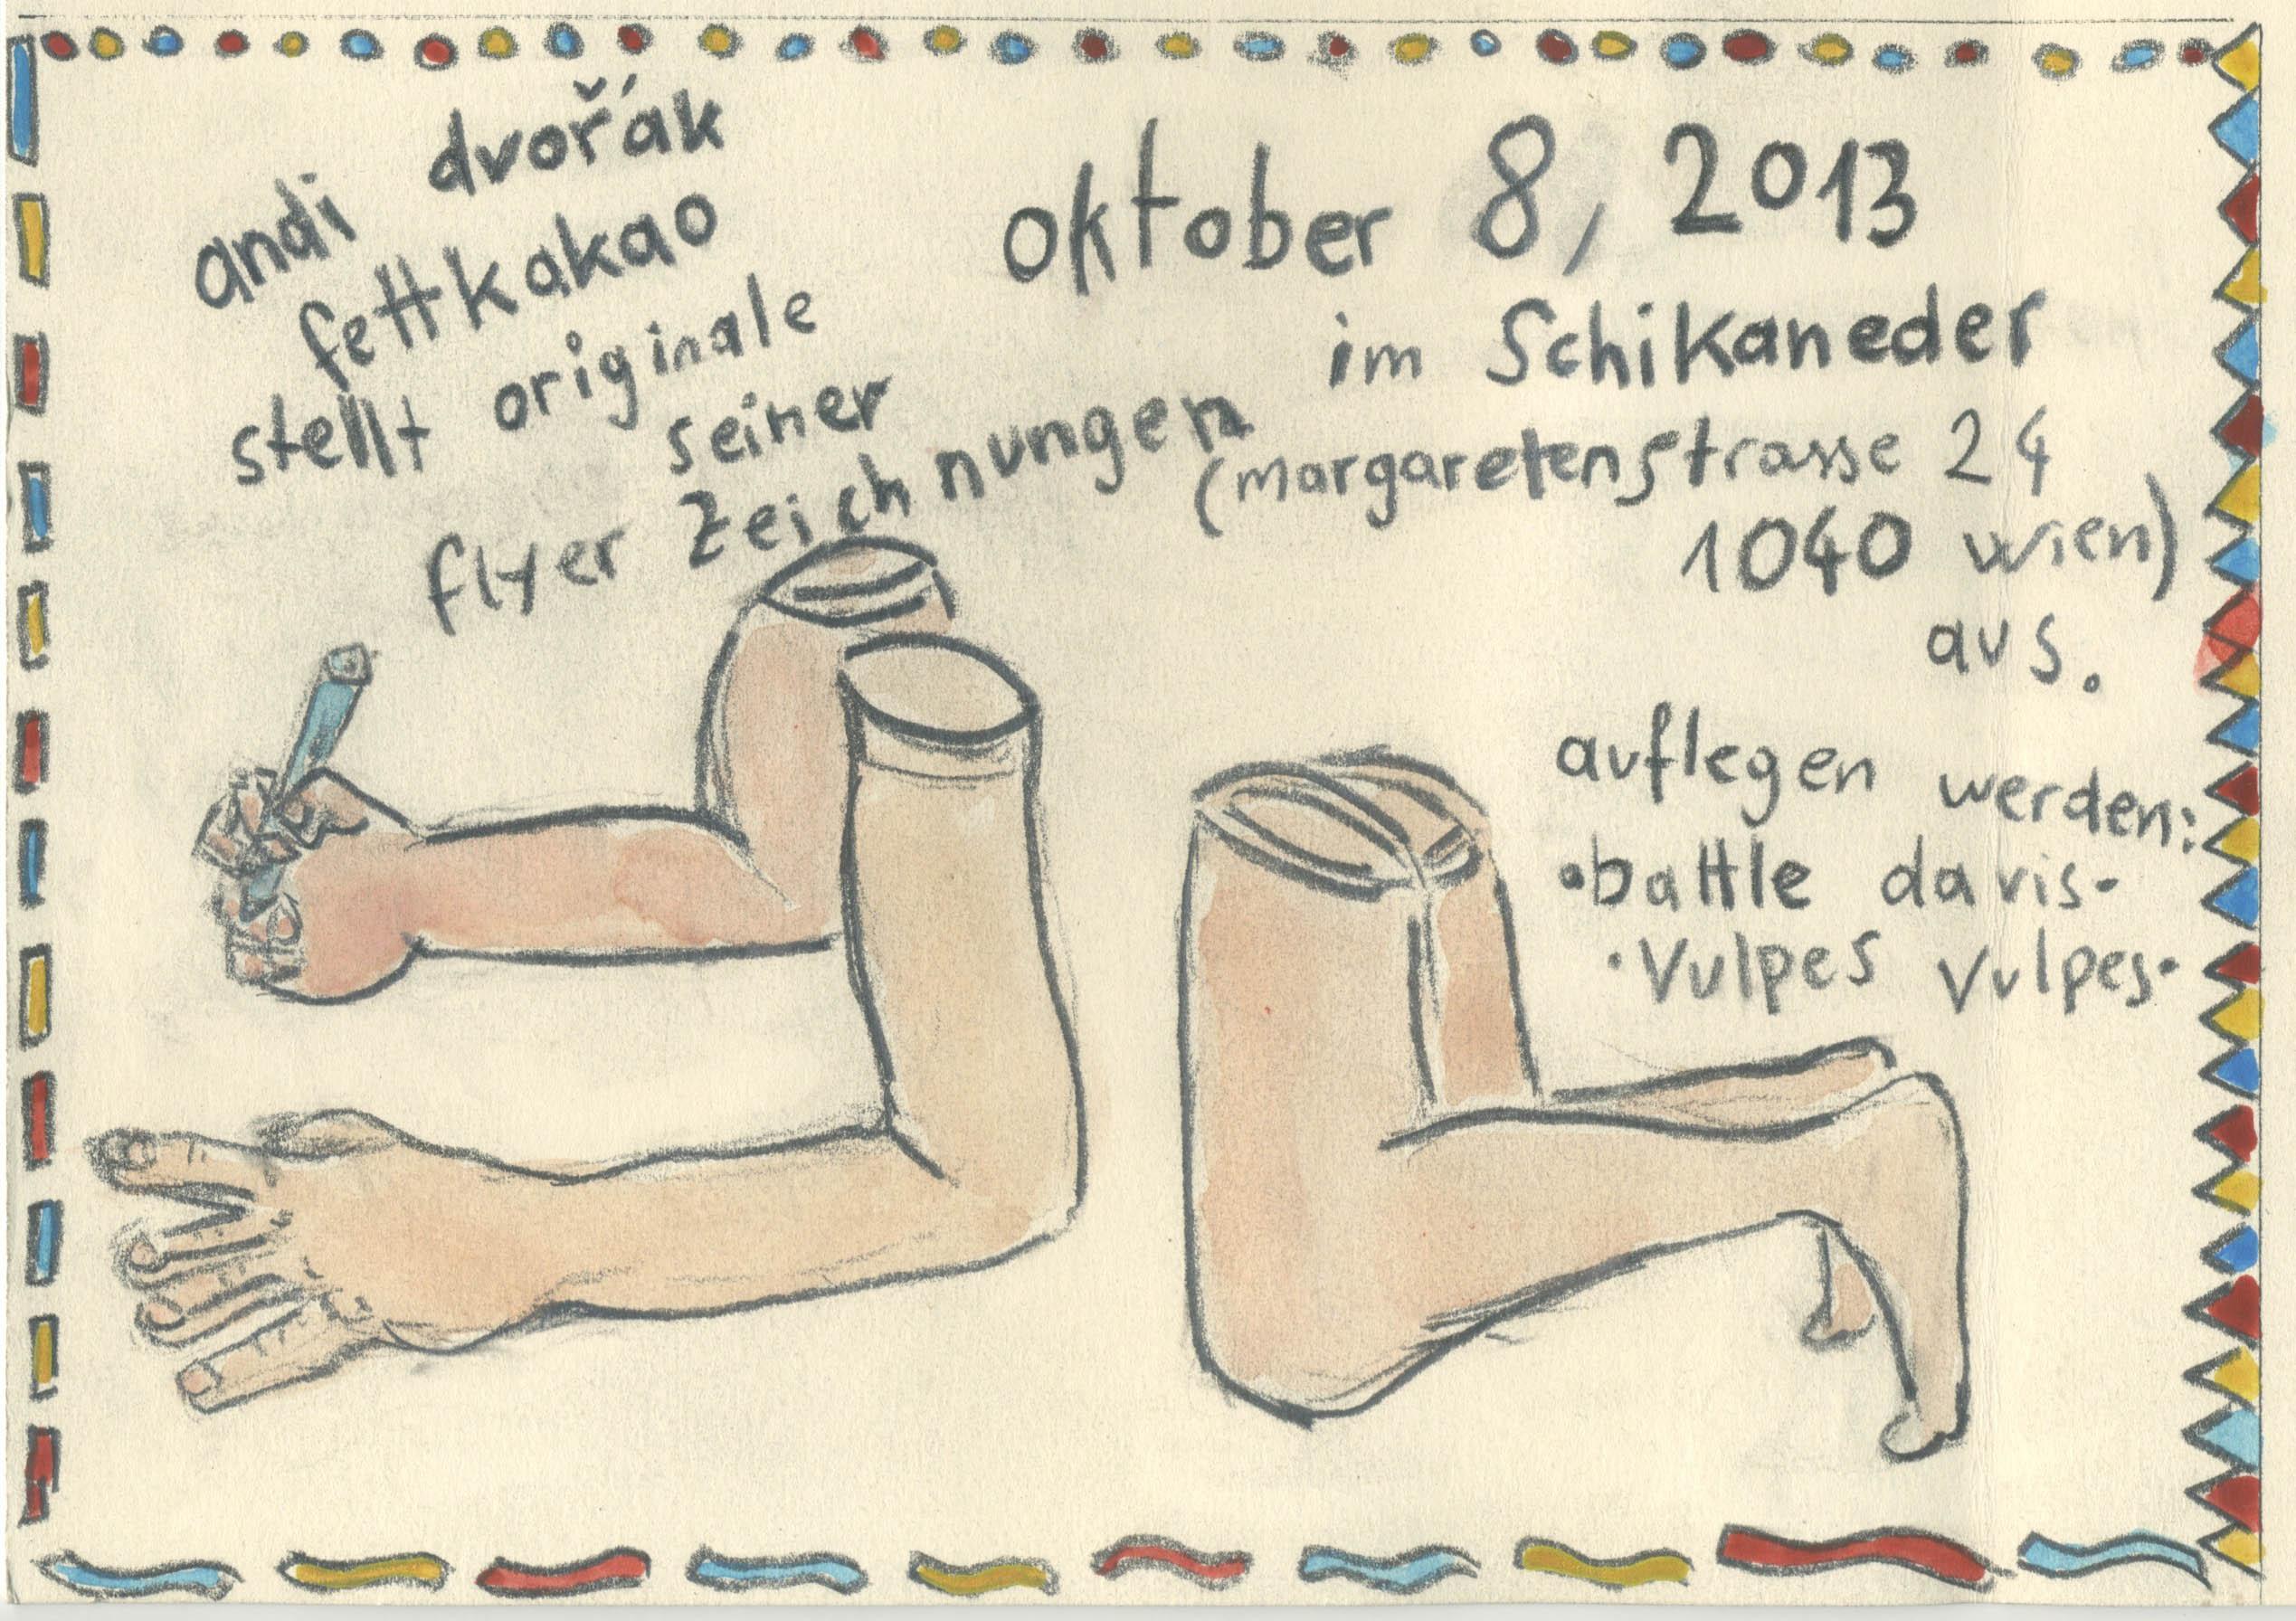 Andi Dvorak exhibits originals of his show flyers